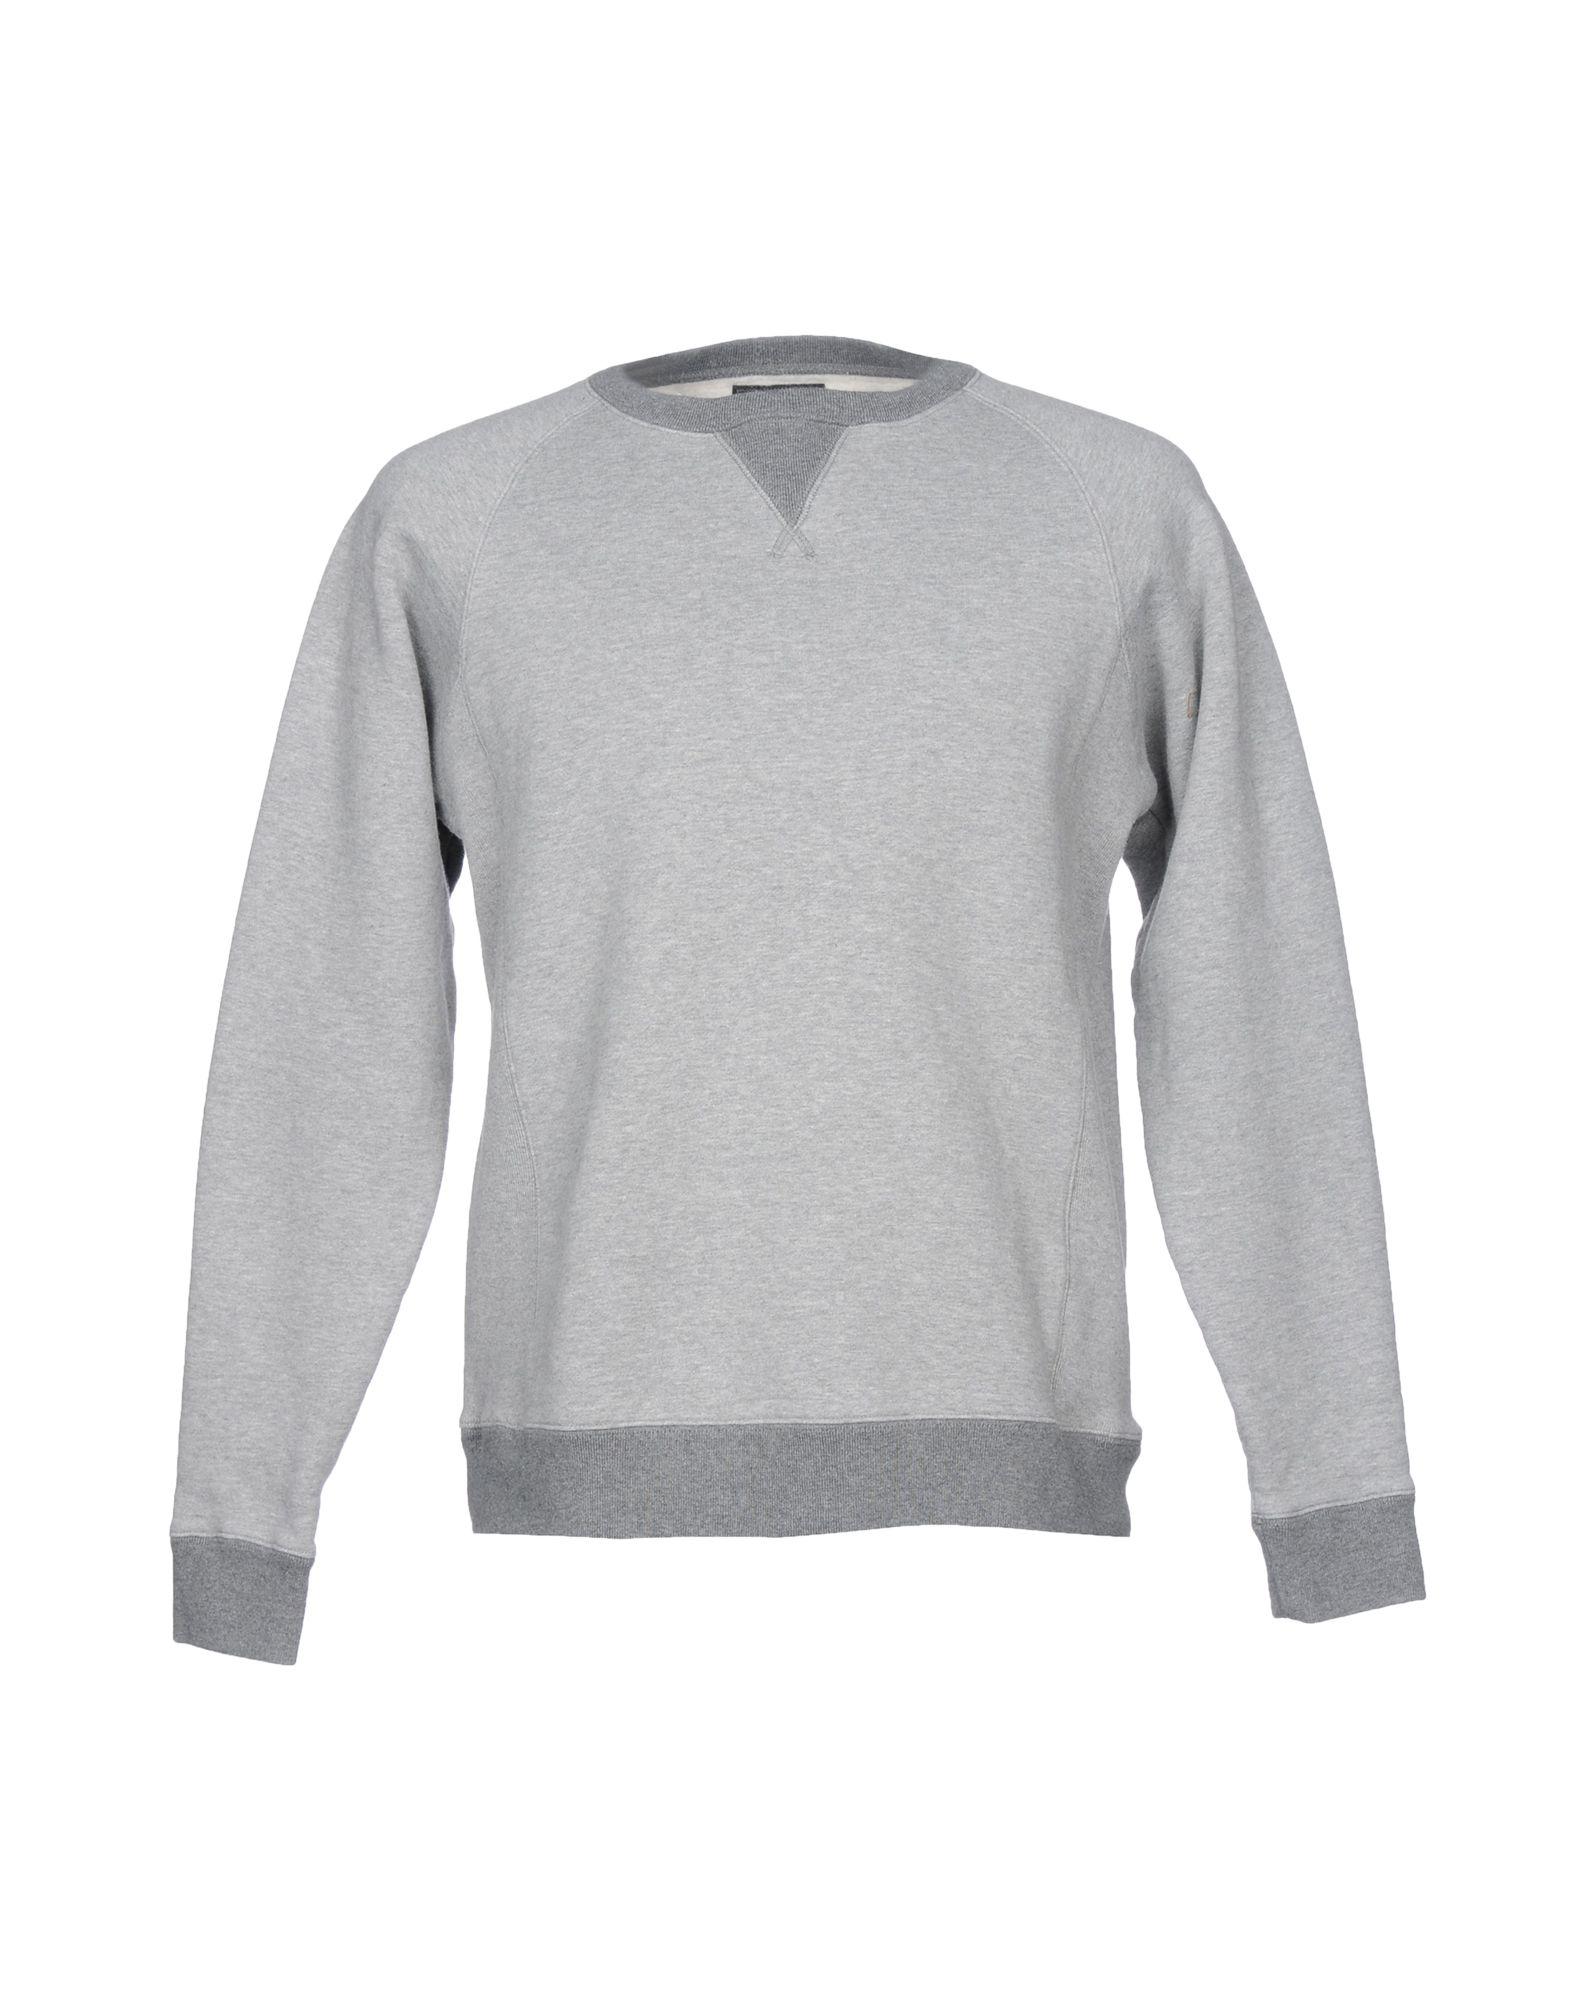 BEAMS Sweatshirt in Light Grey